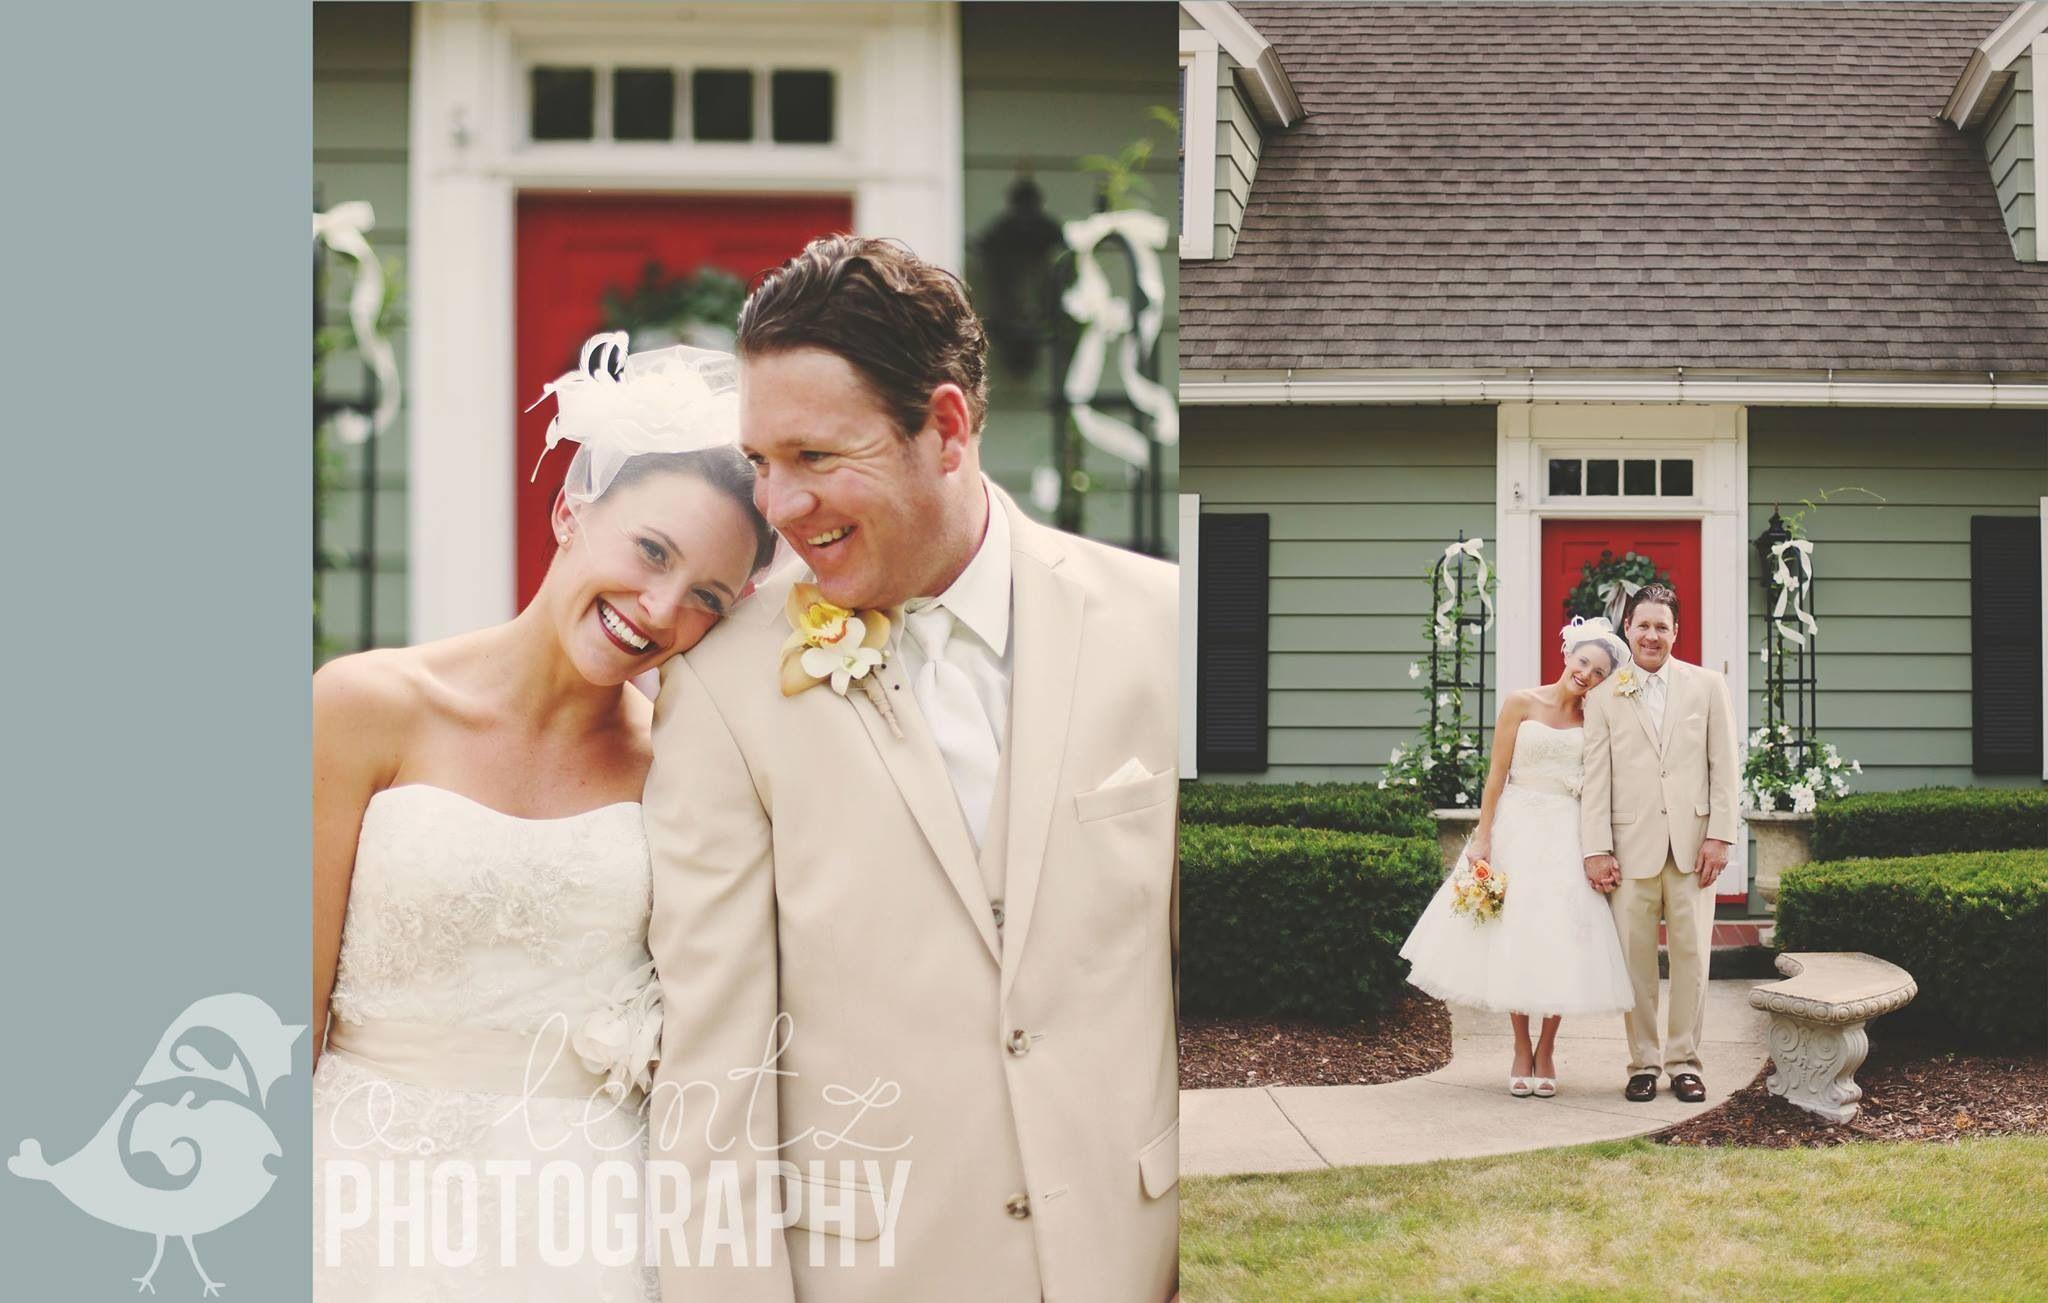 T-length wedding dress. Blusher. True love. Outdoor wedding ceremony.